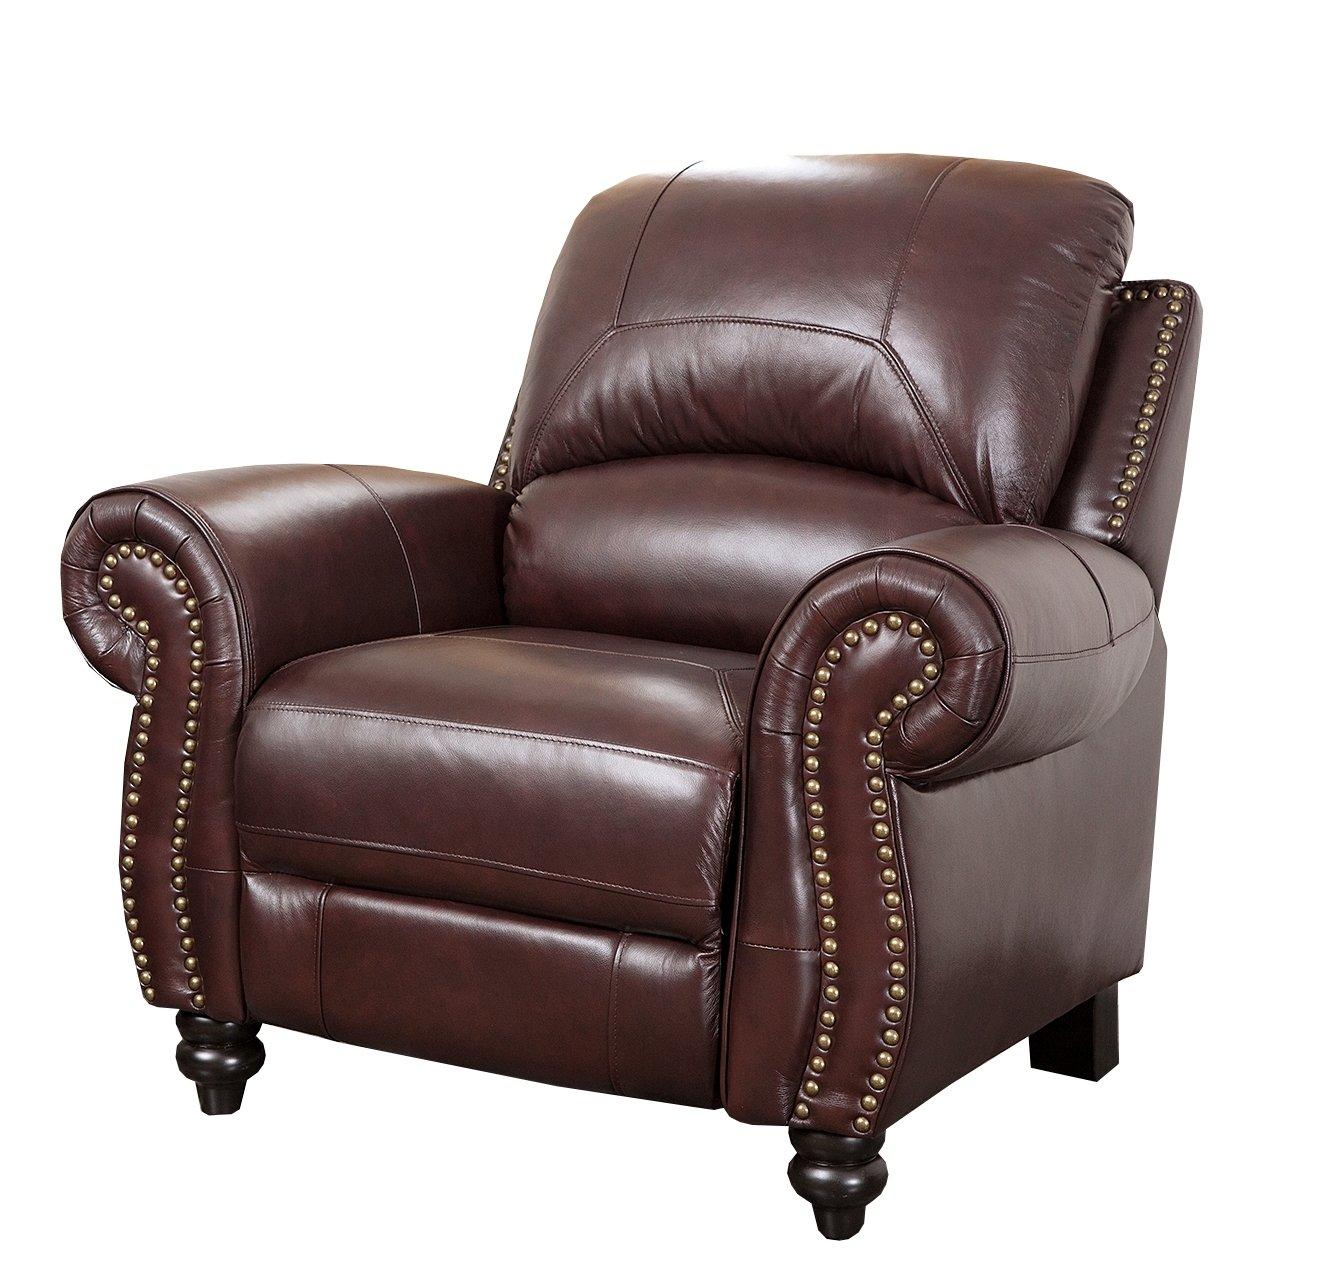 Amazoncom Abbyson Durham Leather Pushback Reclining Armchair